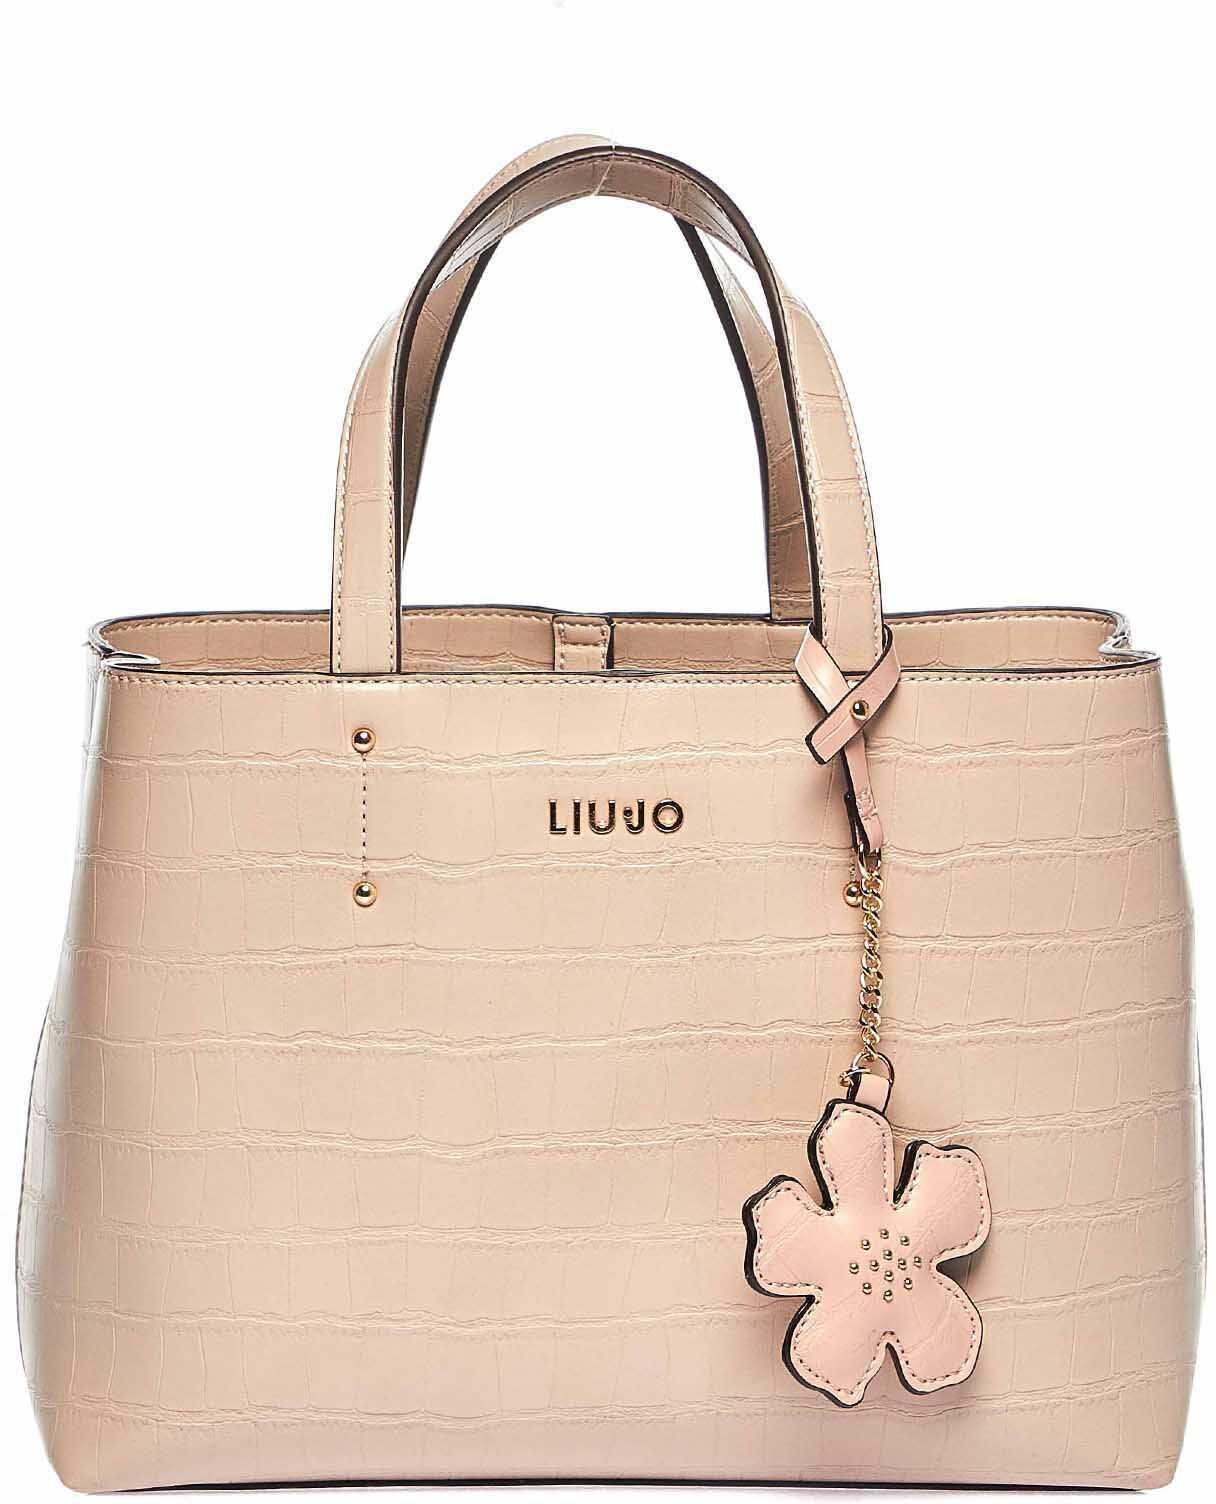 Liu Jo Hand bag